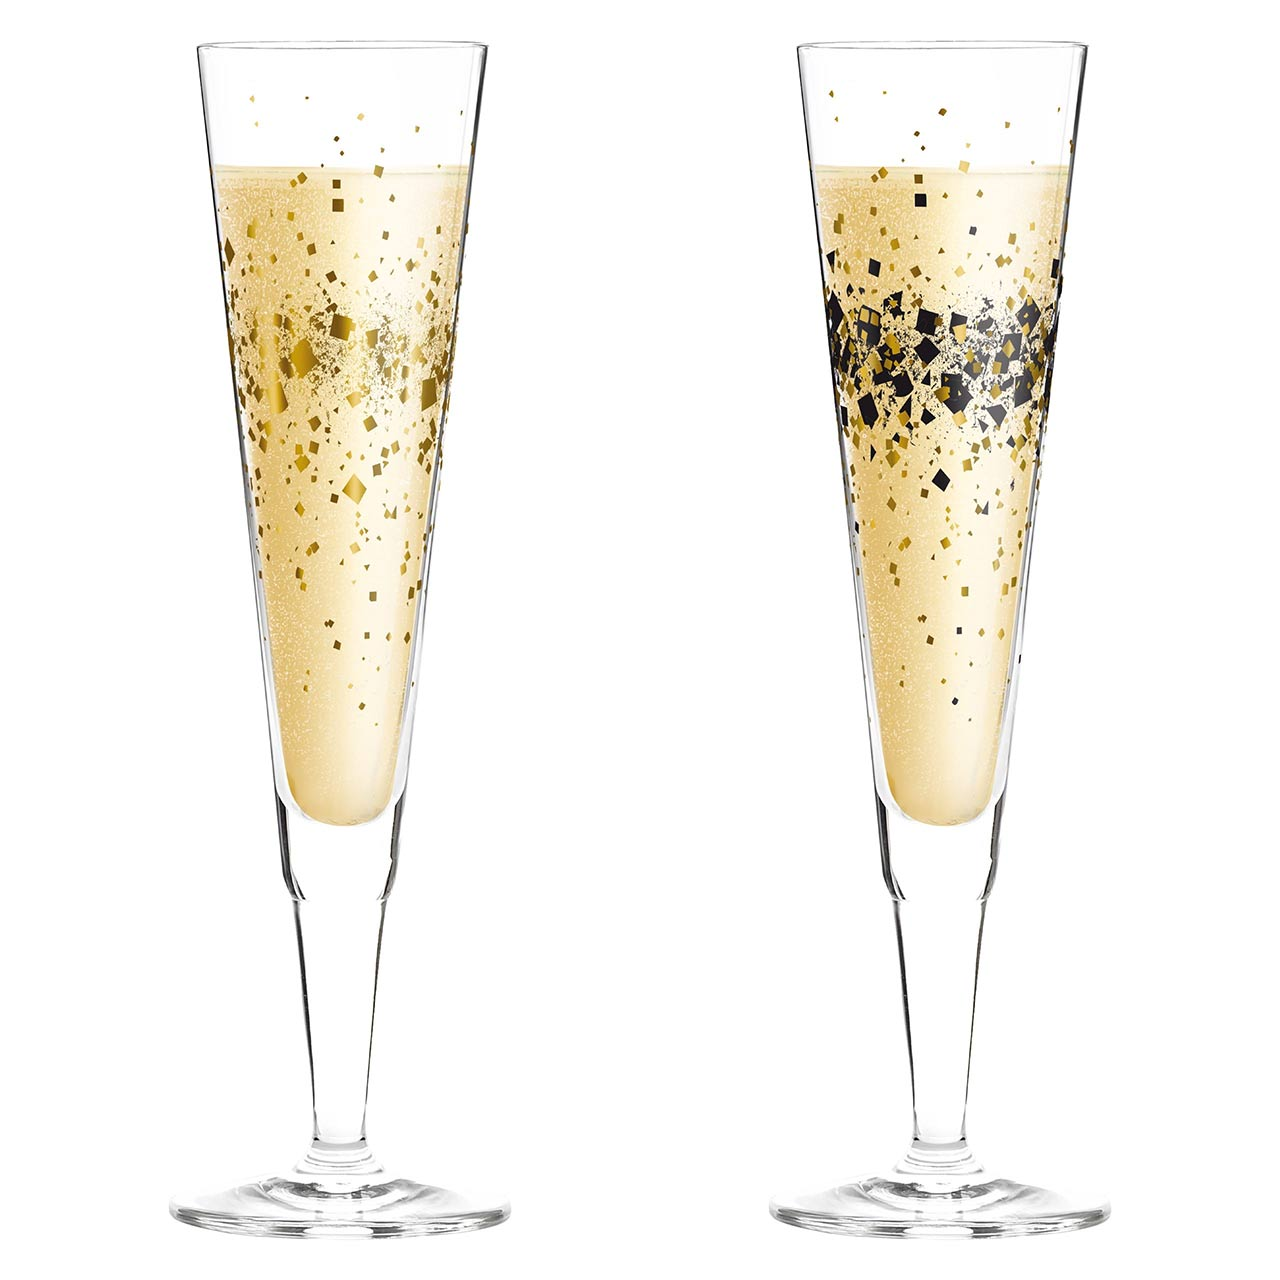 RITZENHOFF Champus Champagne Glass Set DAY & NIGHT SPARKLE | the design gift shop